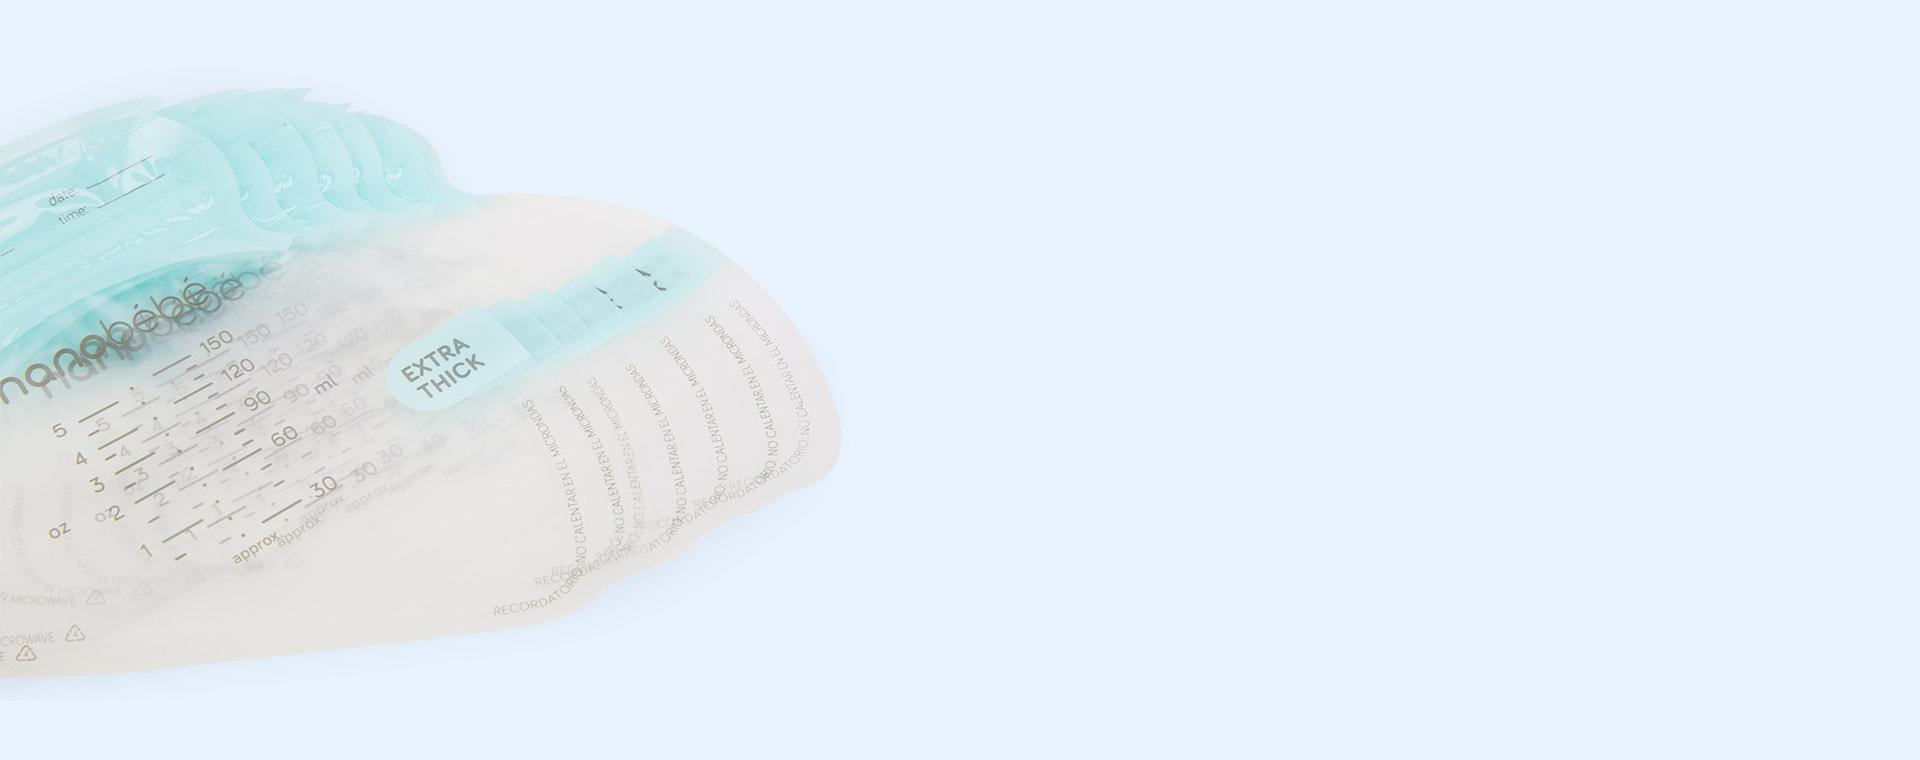 Clear nanobébé 25 Breast Milk Storage Bags and Organiser